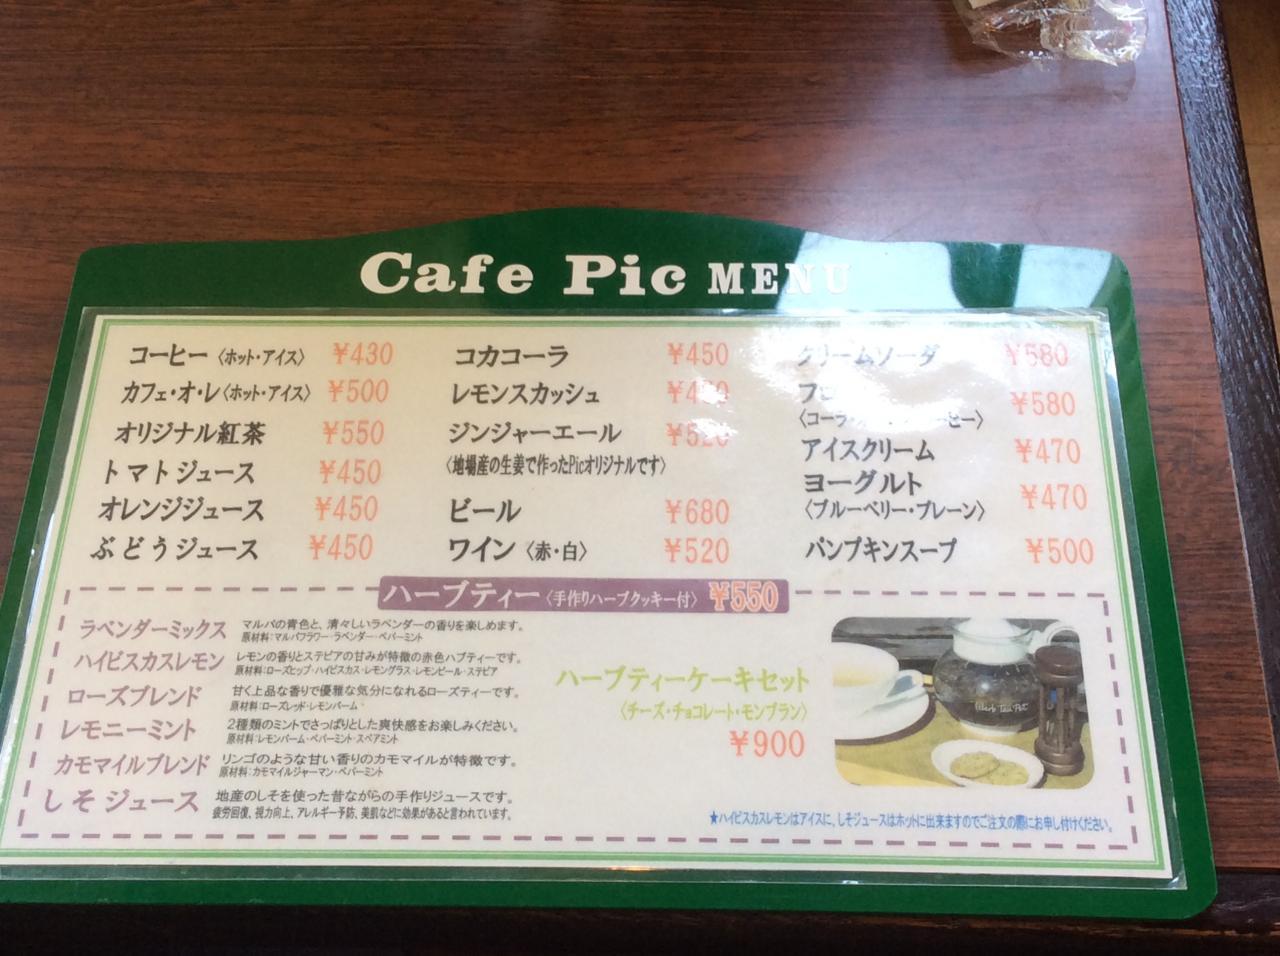 CafePic(メニュー)